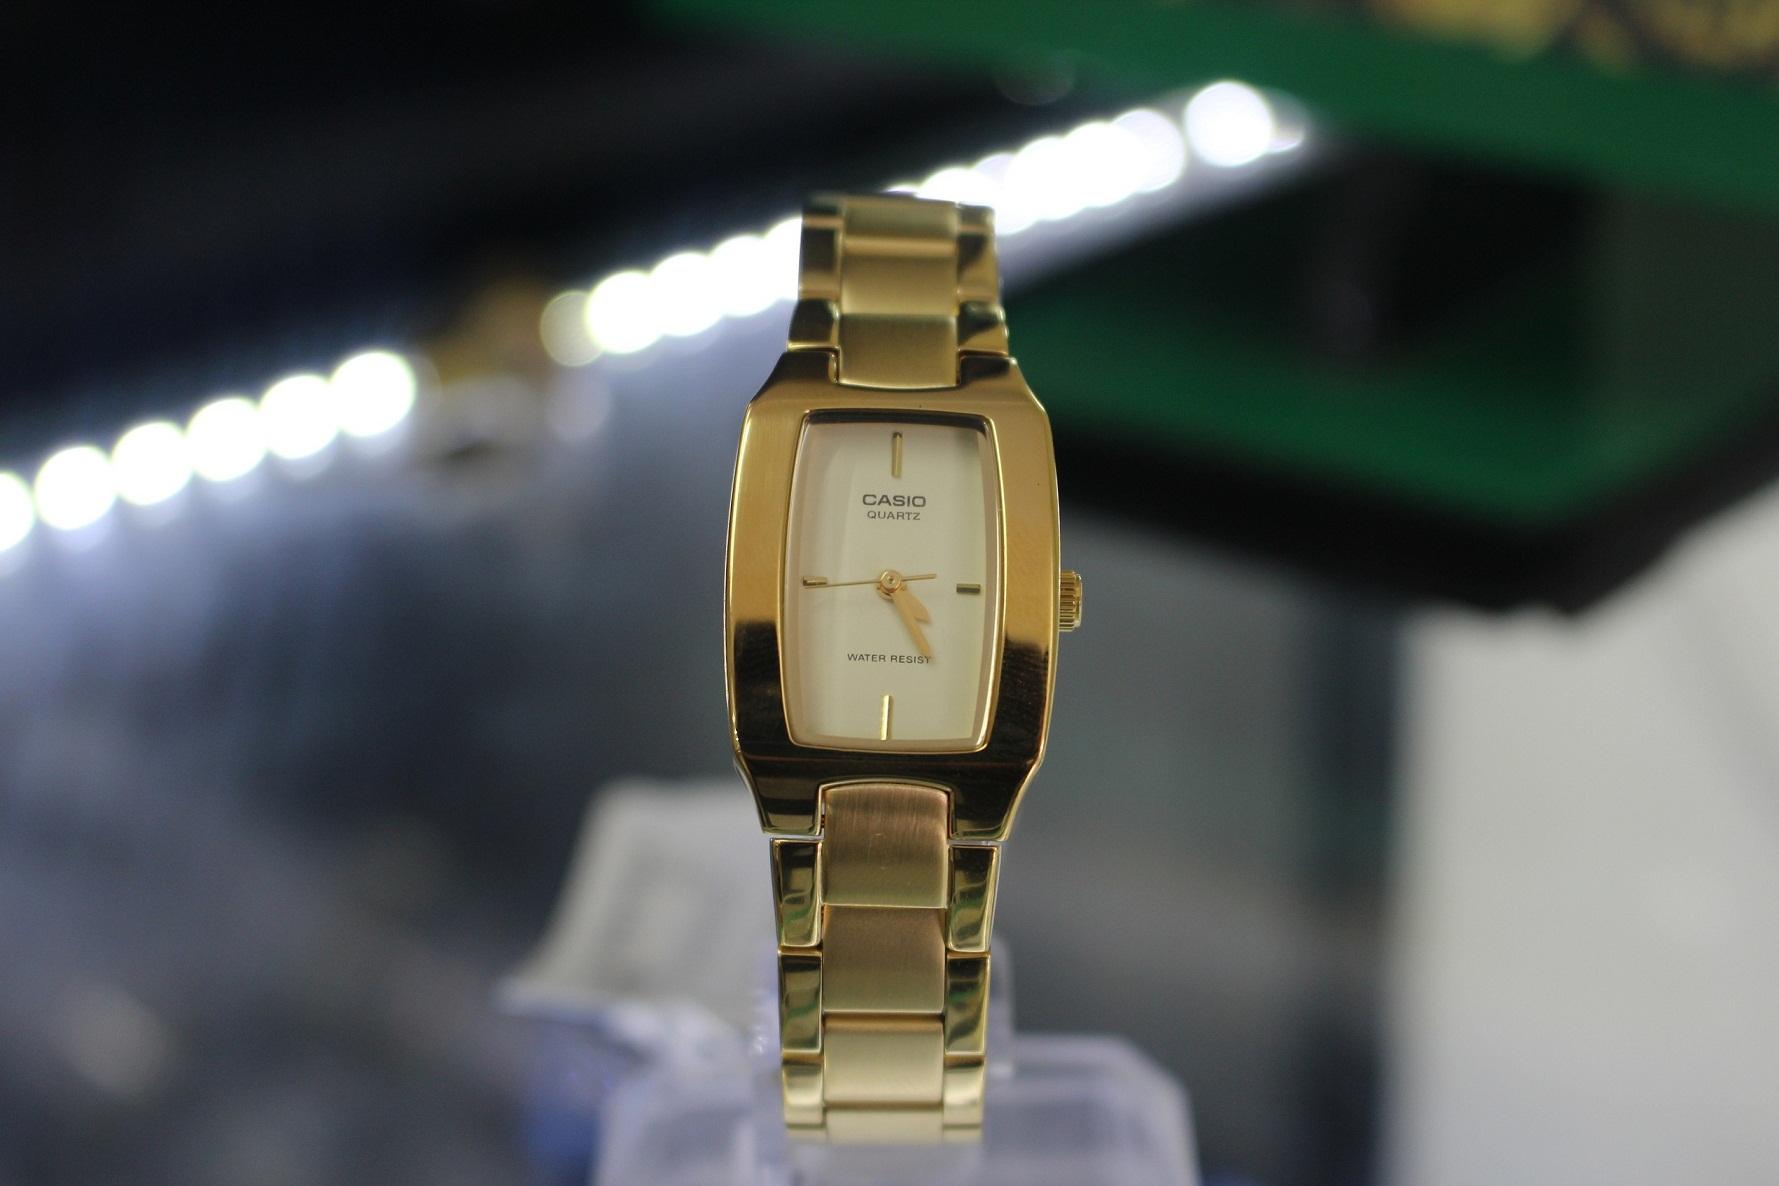 Đồng hồ Casio nữ LTP-1165N-9CRDF